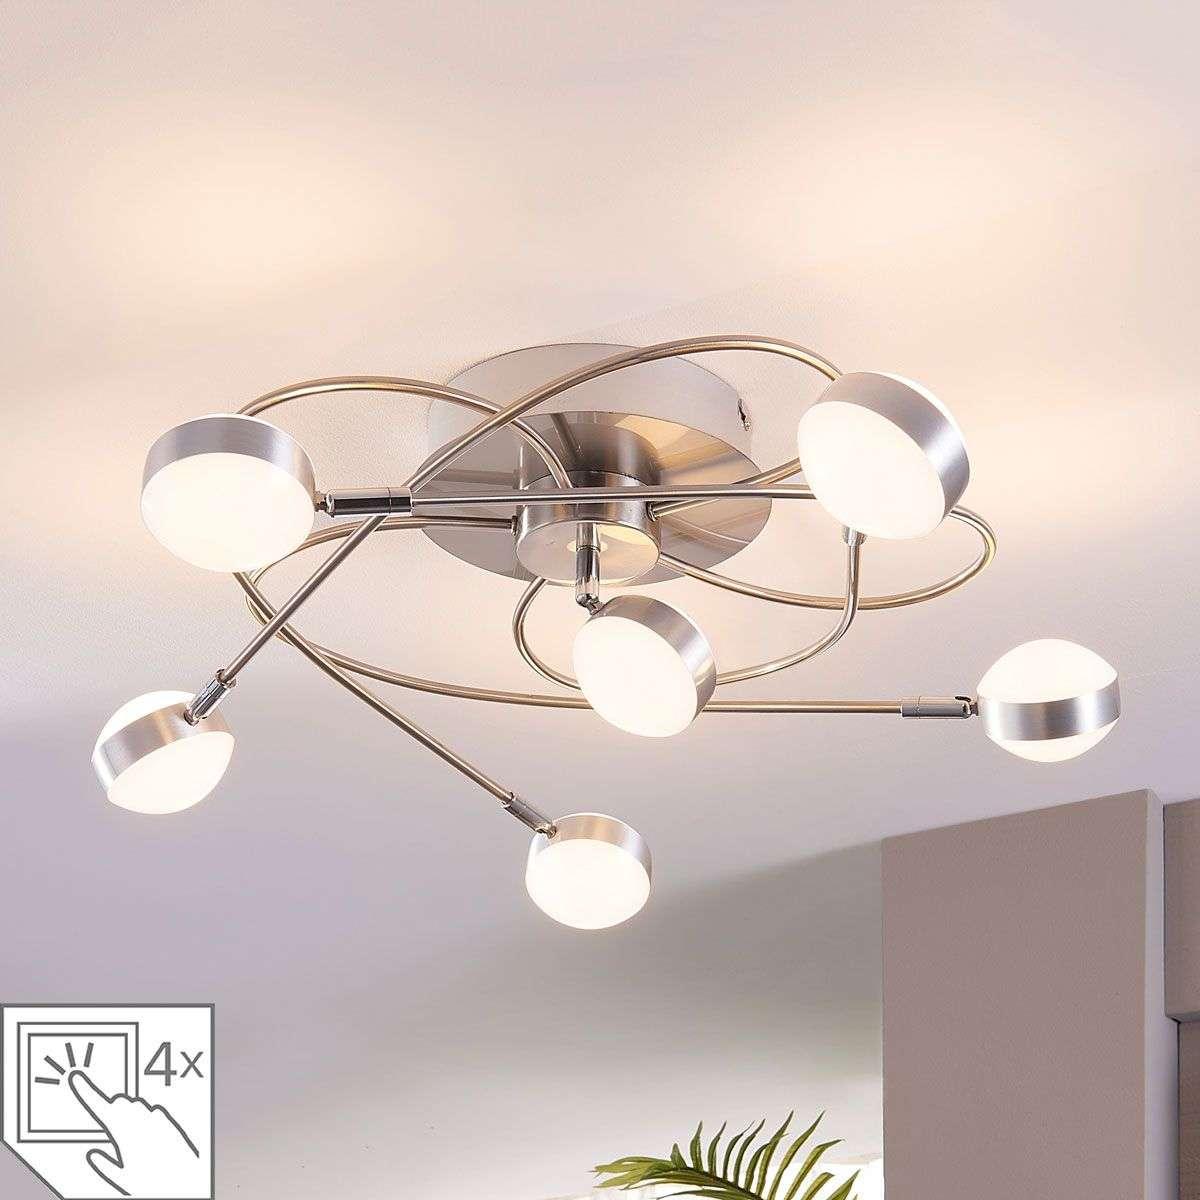 Marlon bright led ceiling light lights marlon bright led ceiling light 9620963 31 arubaitofo Gallery